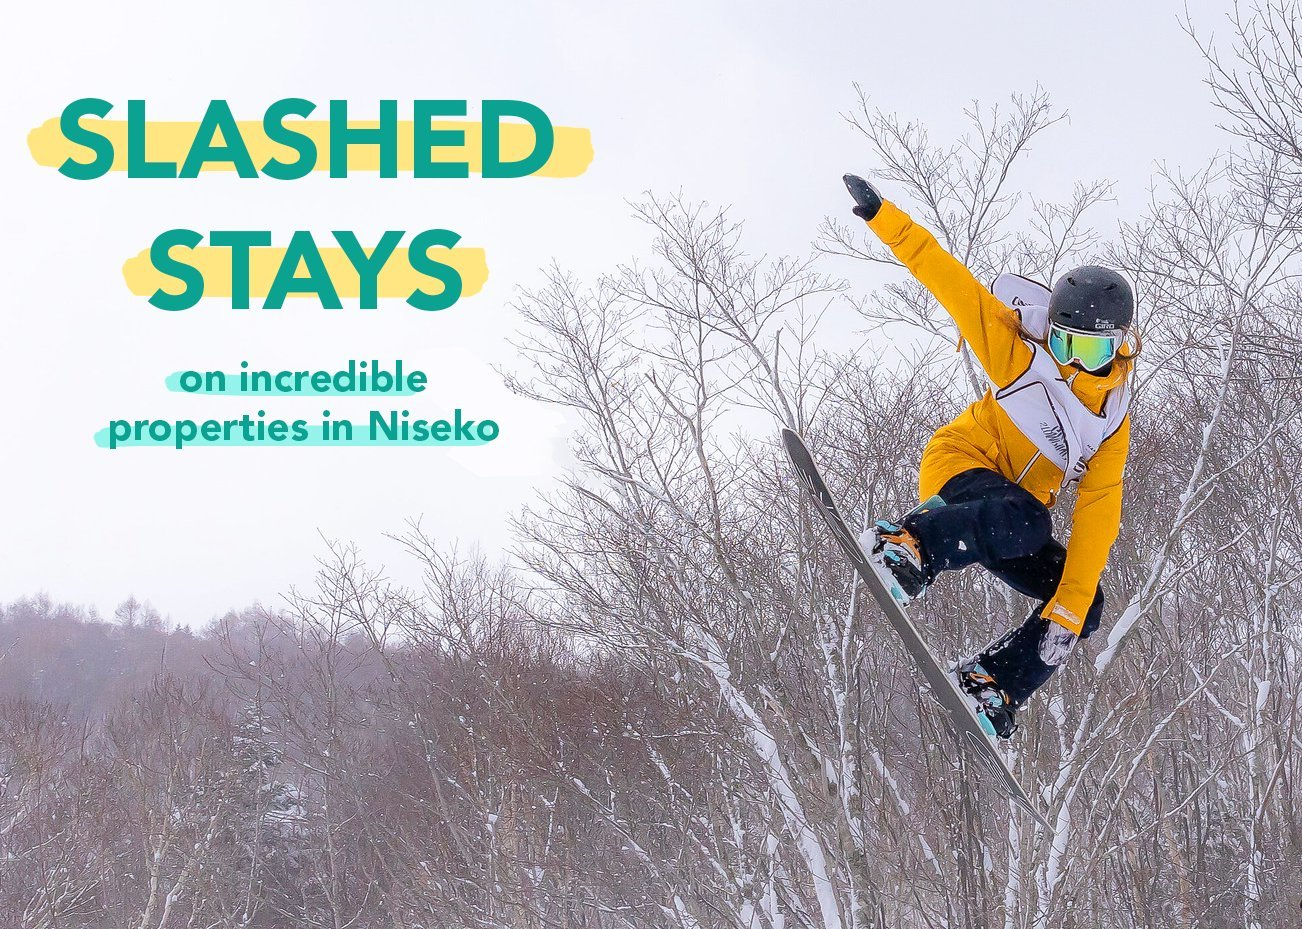 slashed stays in incredible niseko properties with vacation niseko.